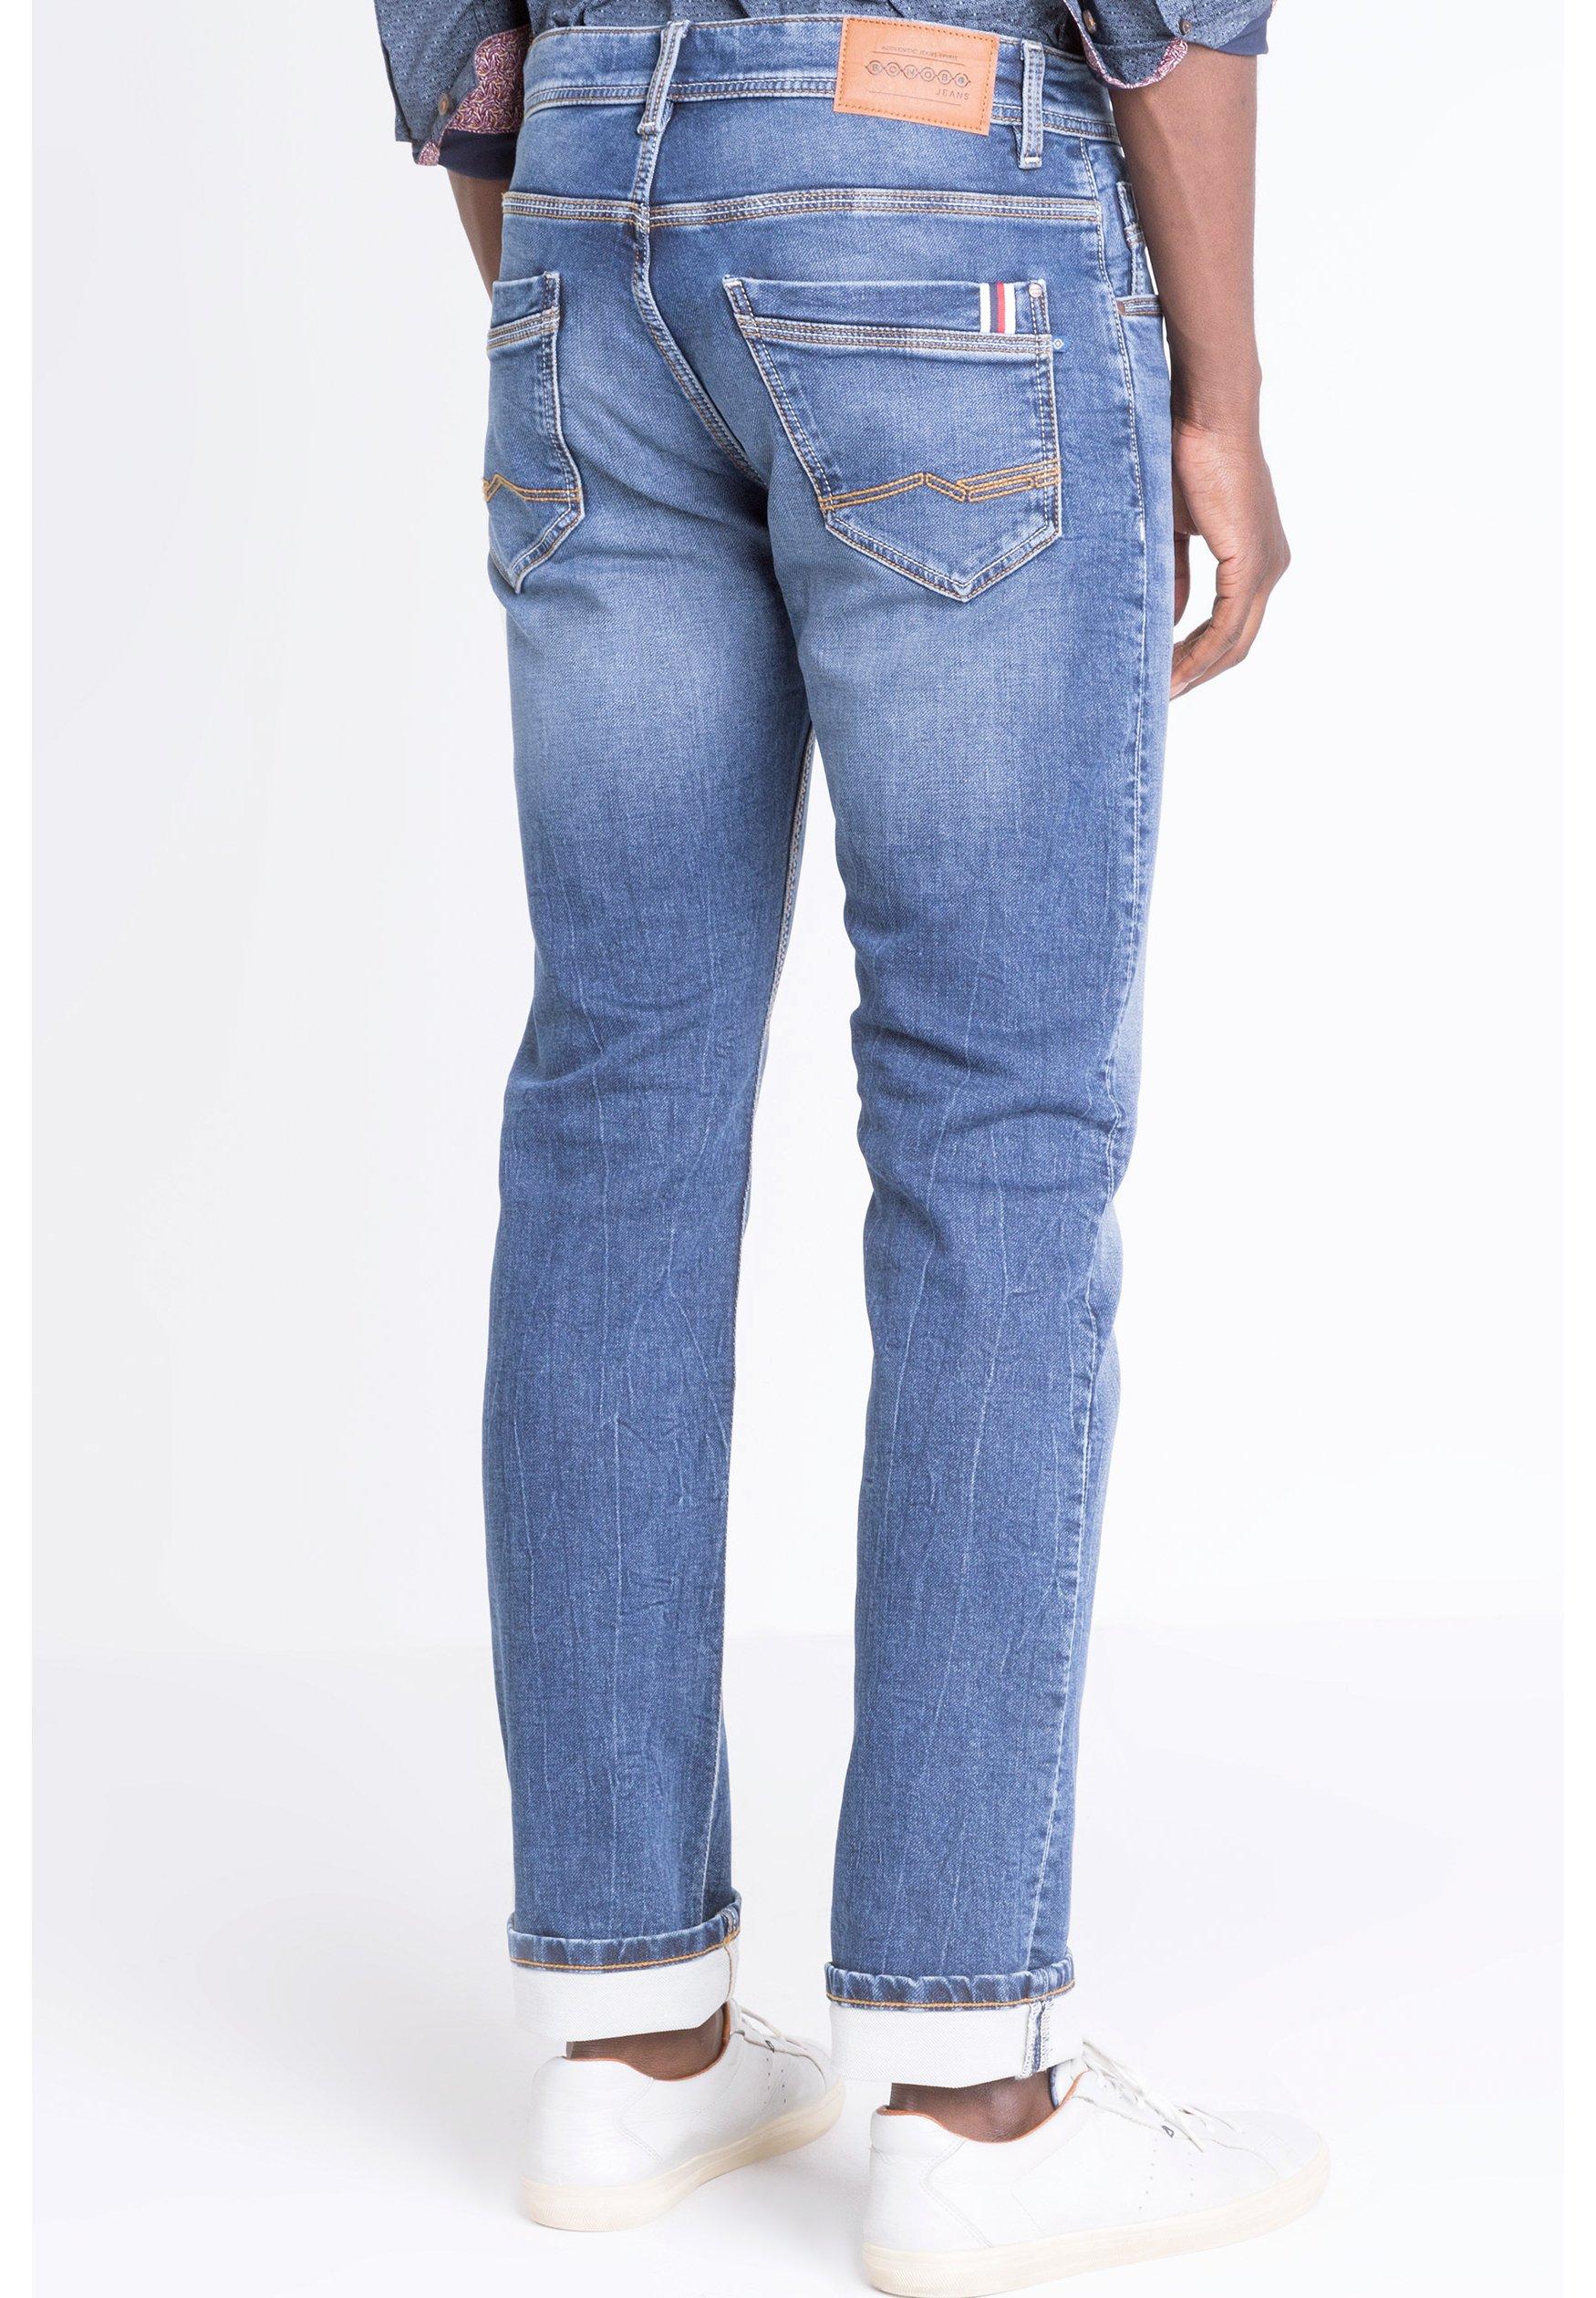 BONOBO Jeans BONOBO  - Jean droit - stone blue denim